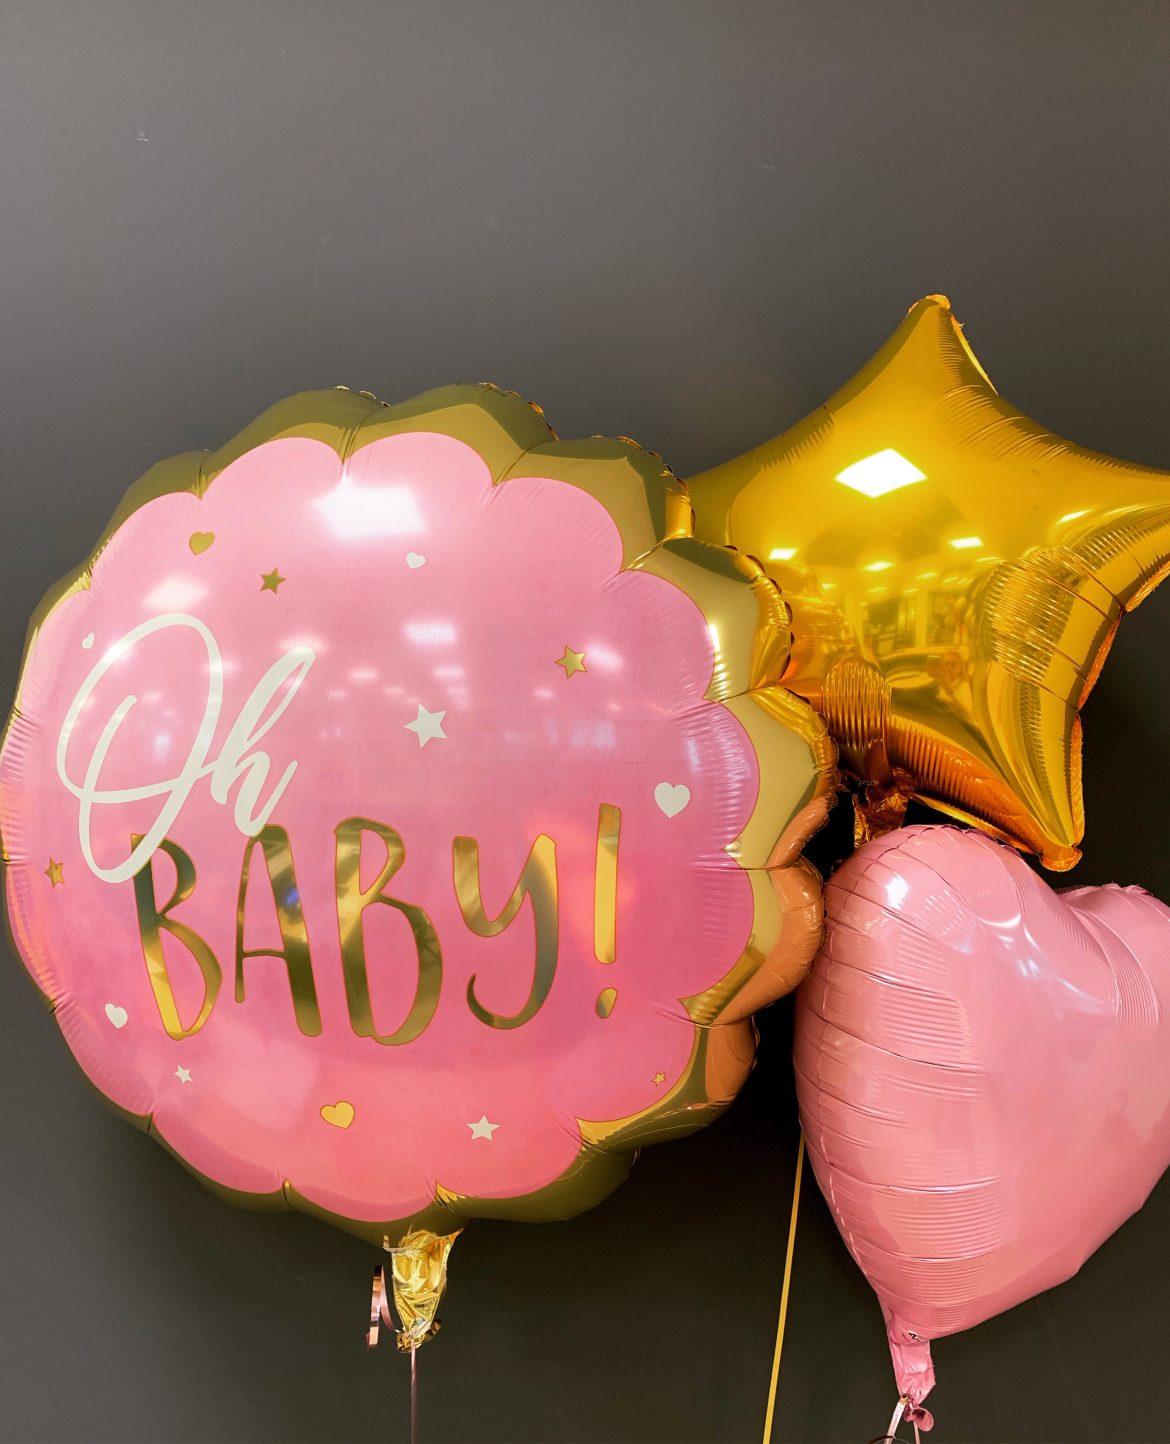 Ballon zur Geburt 6